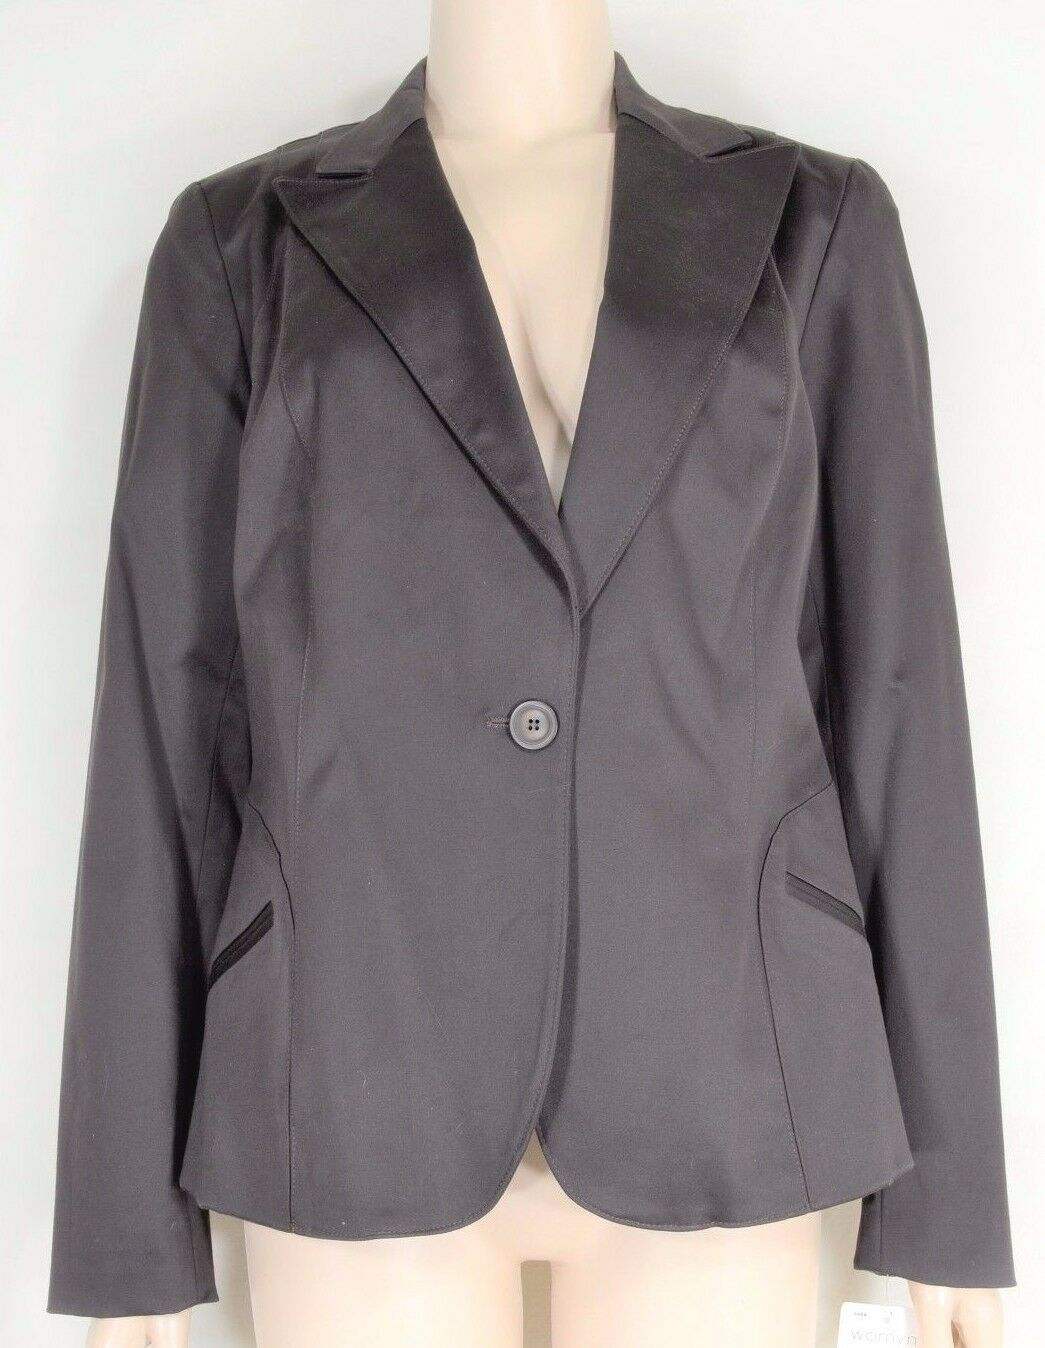 womyn jacket coat NWT SZ 8 dark brown 1-button closure lined NYC USA new